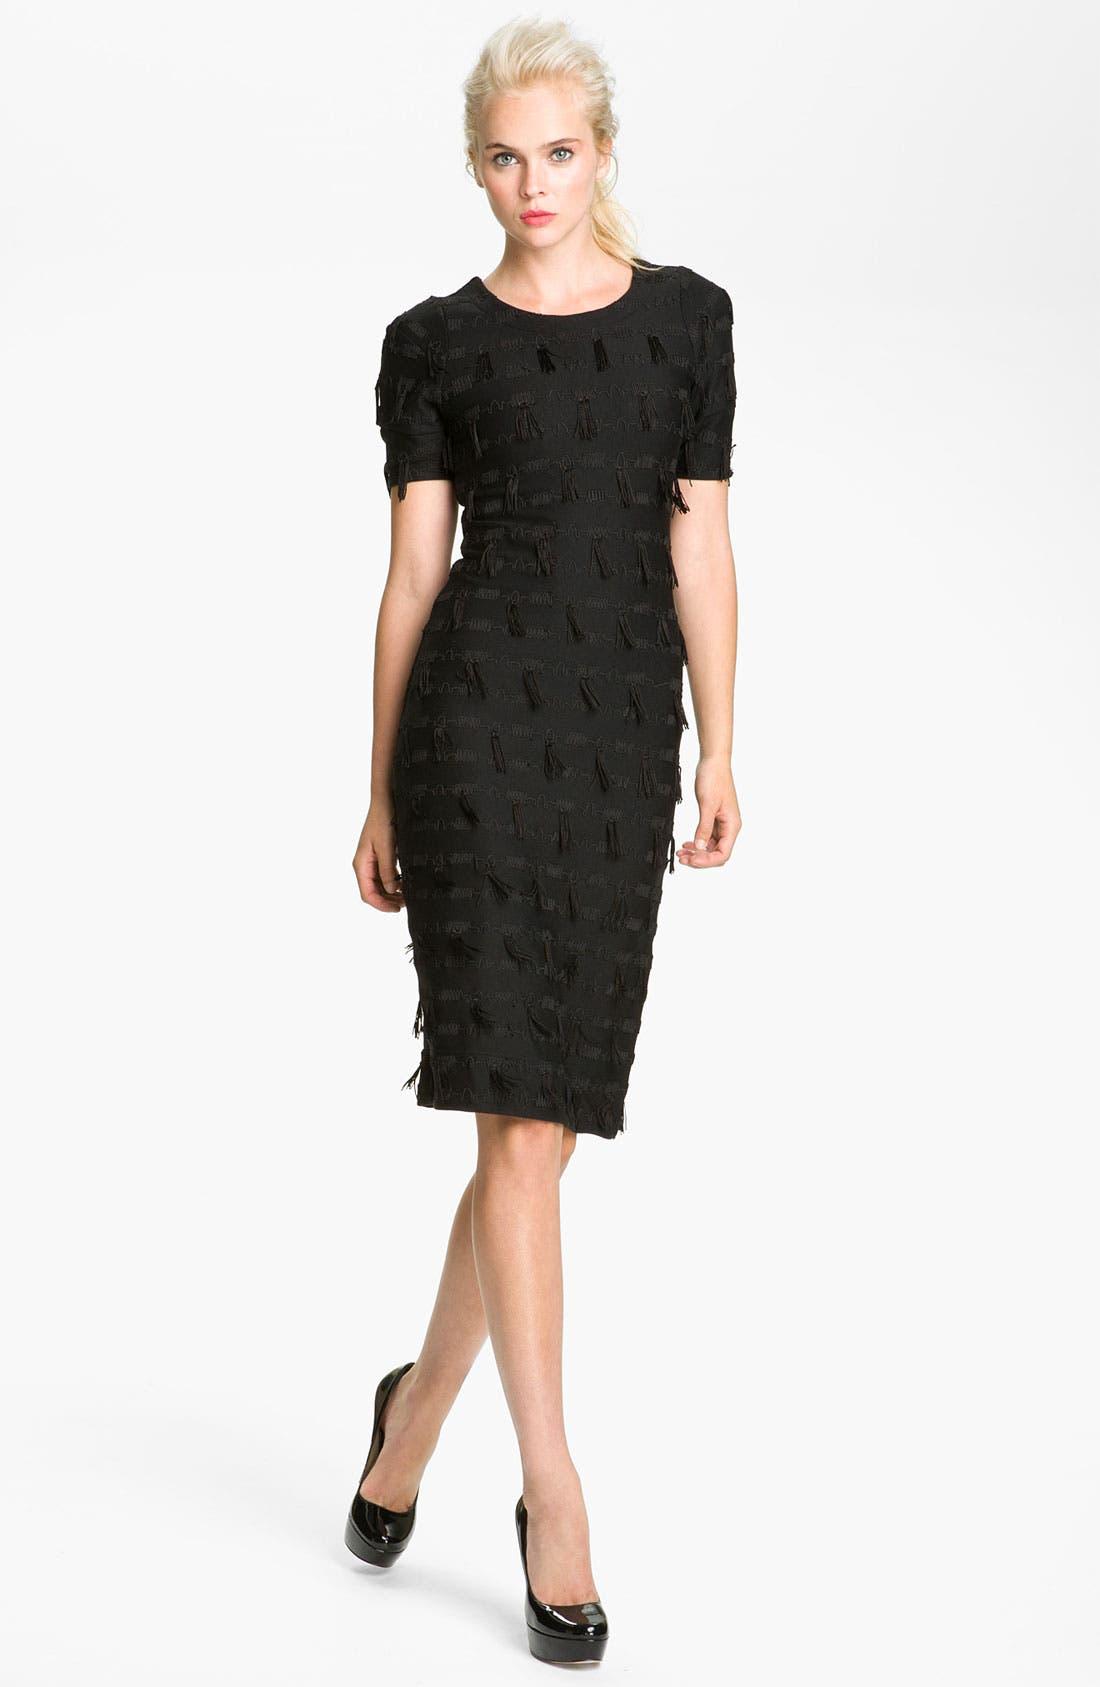 Alternate Image 1 Selected - MARC BY MARC JACOBS 'Frankie' Fringe Dress